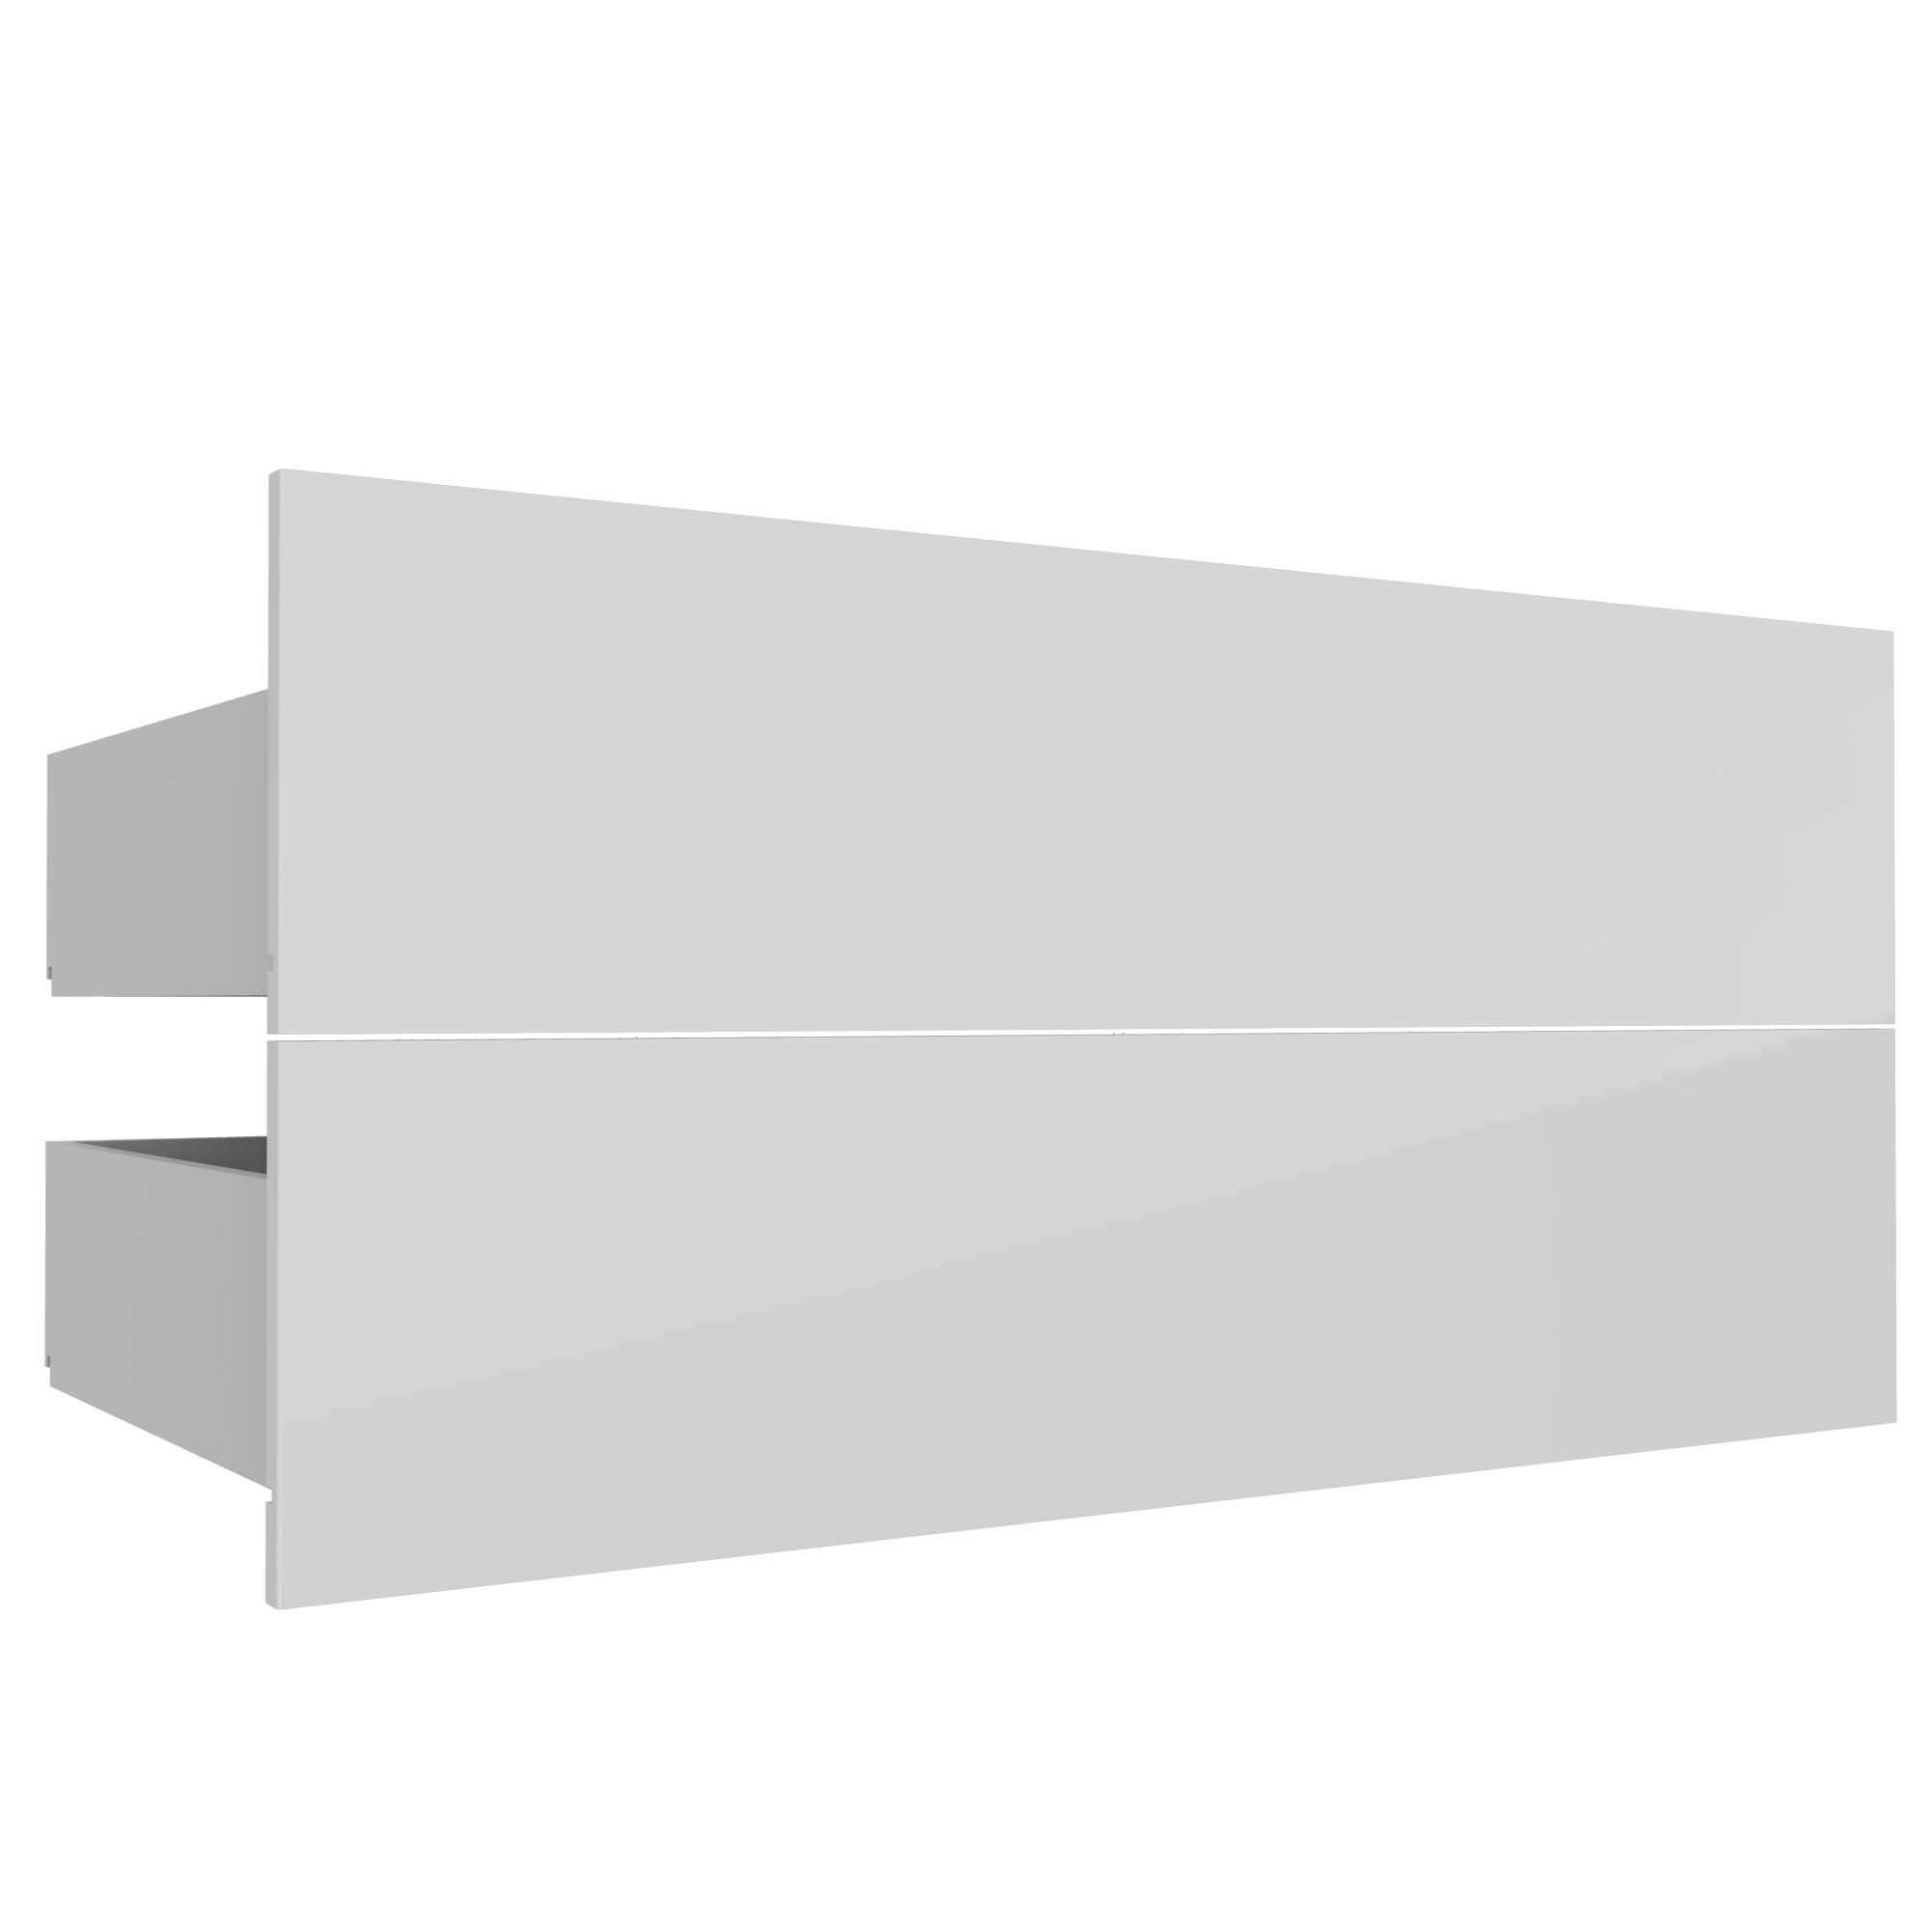 Darwin Modular White External Drawers (w) 1000mm (d) 514mm, Pack Of 2